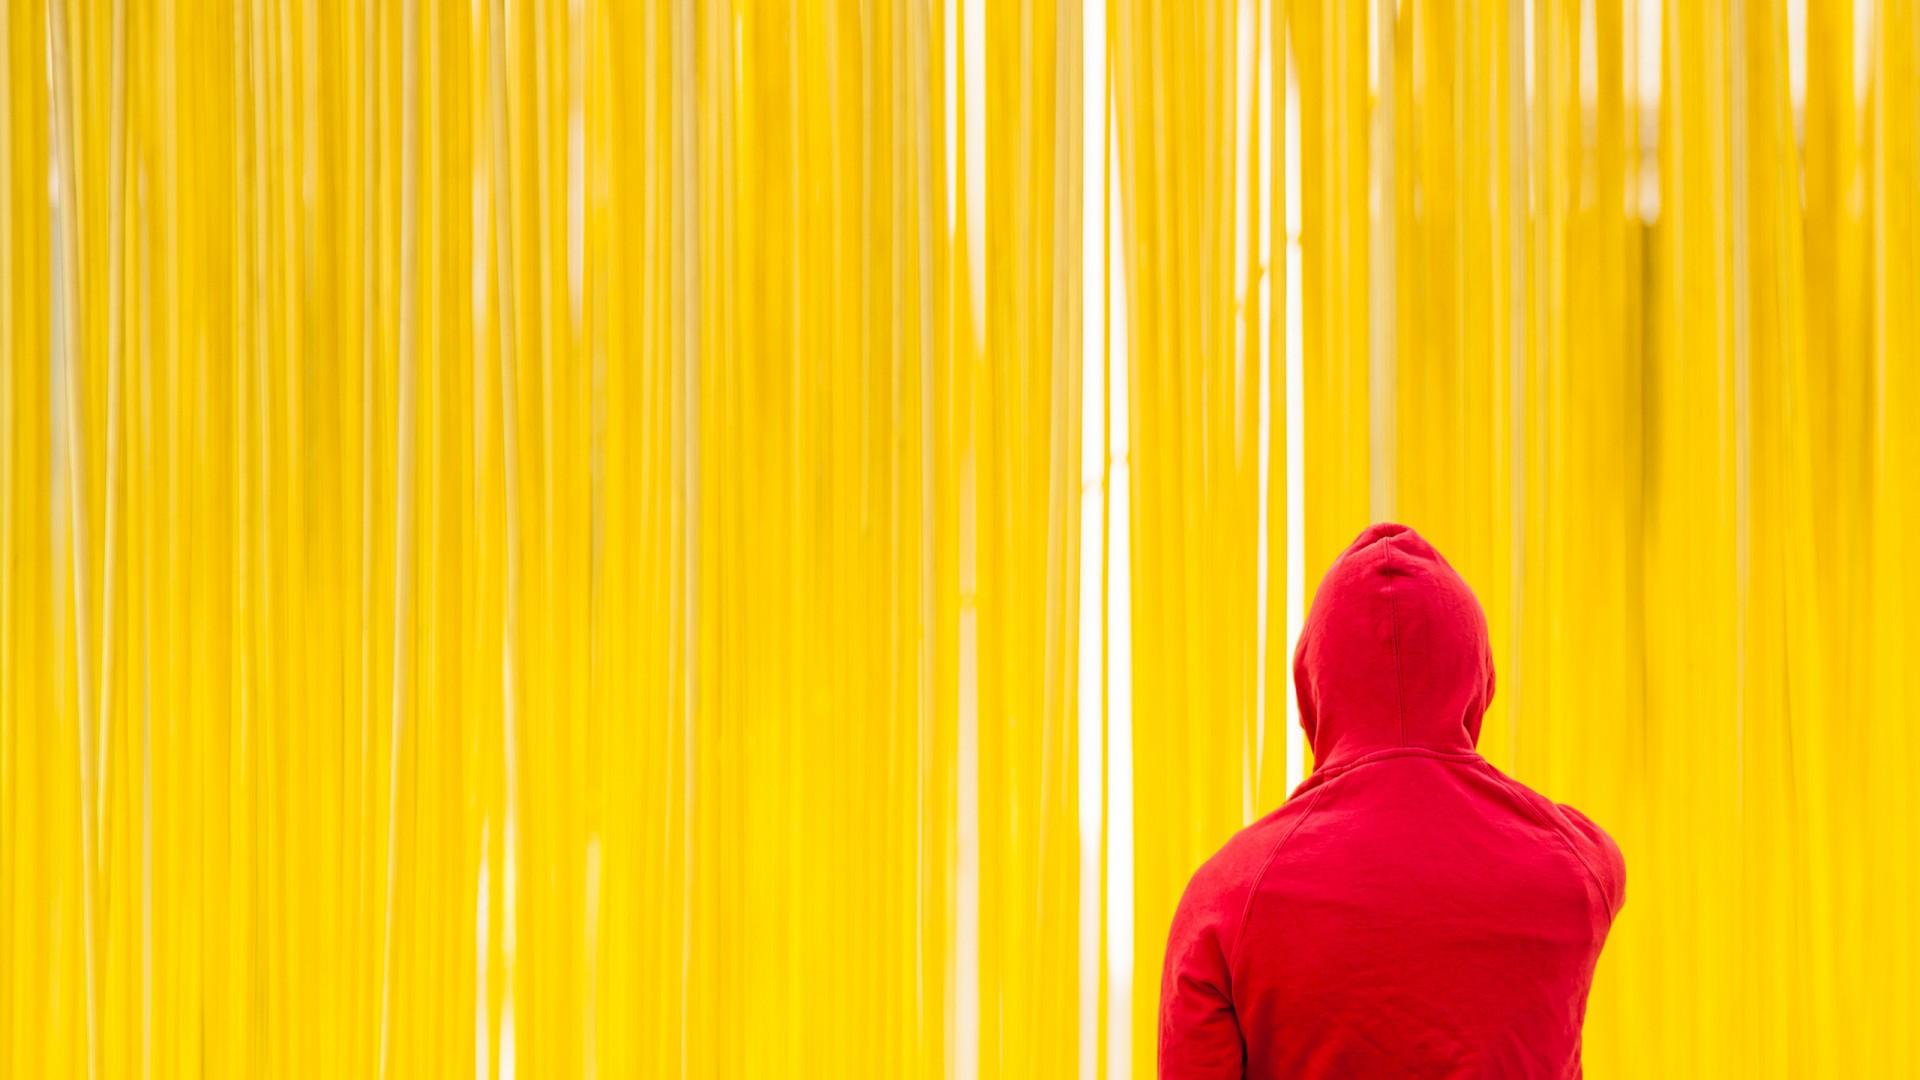 Spiral Wallpaper 3d Red Hoodie Hd Wallpapers Hd Wallpapers Id 20759